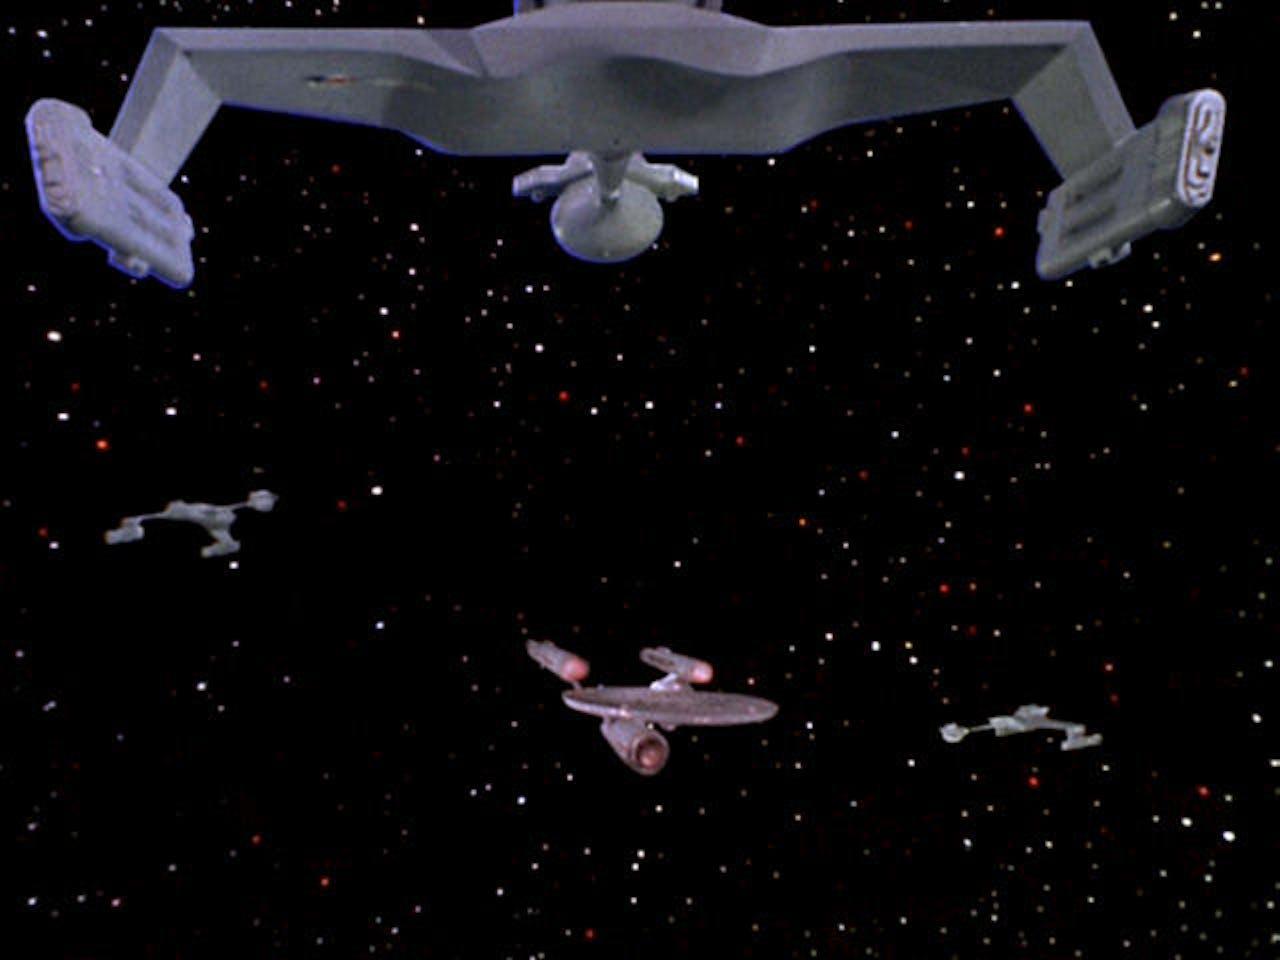 Klingon War Will Launch 'Star Trek: Discovery' | Inverse